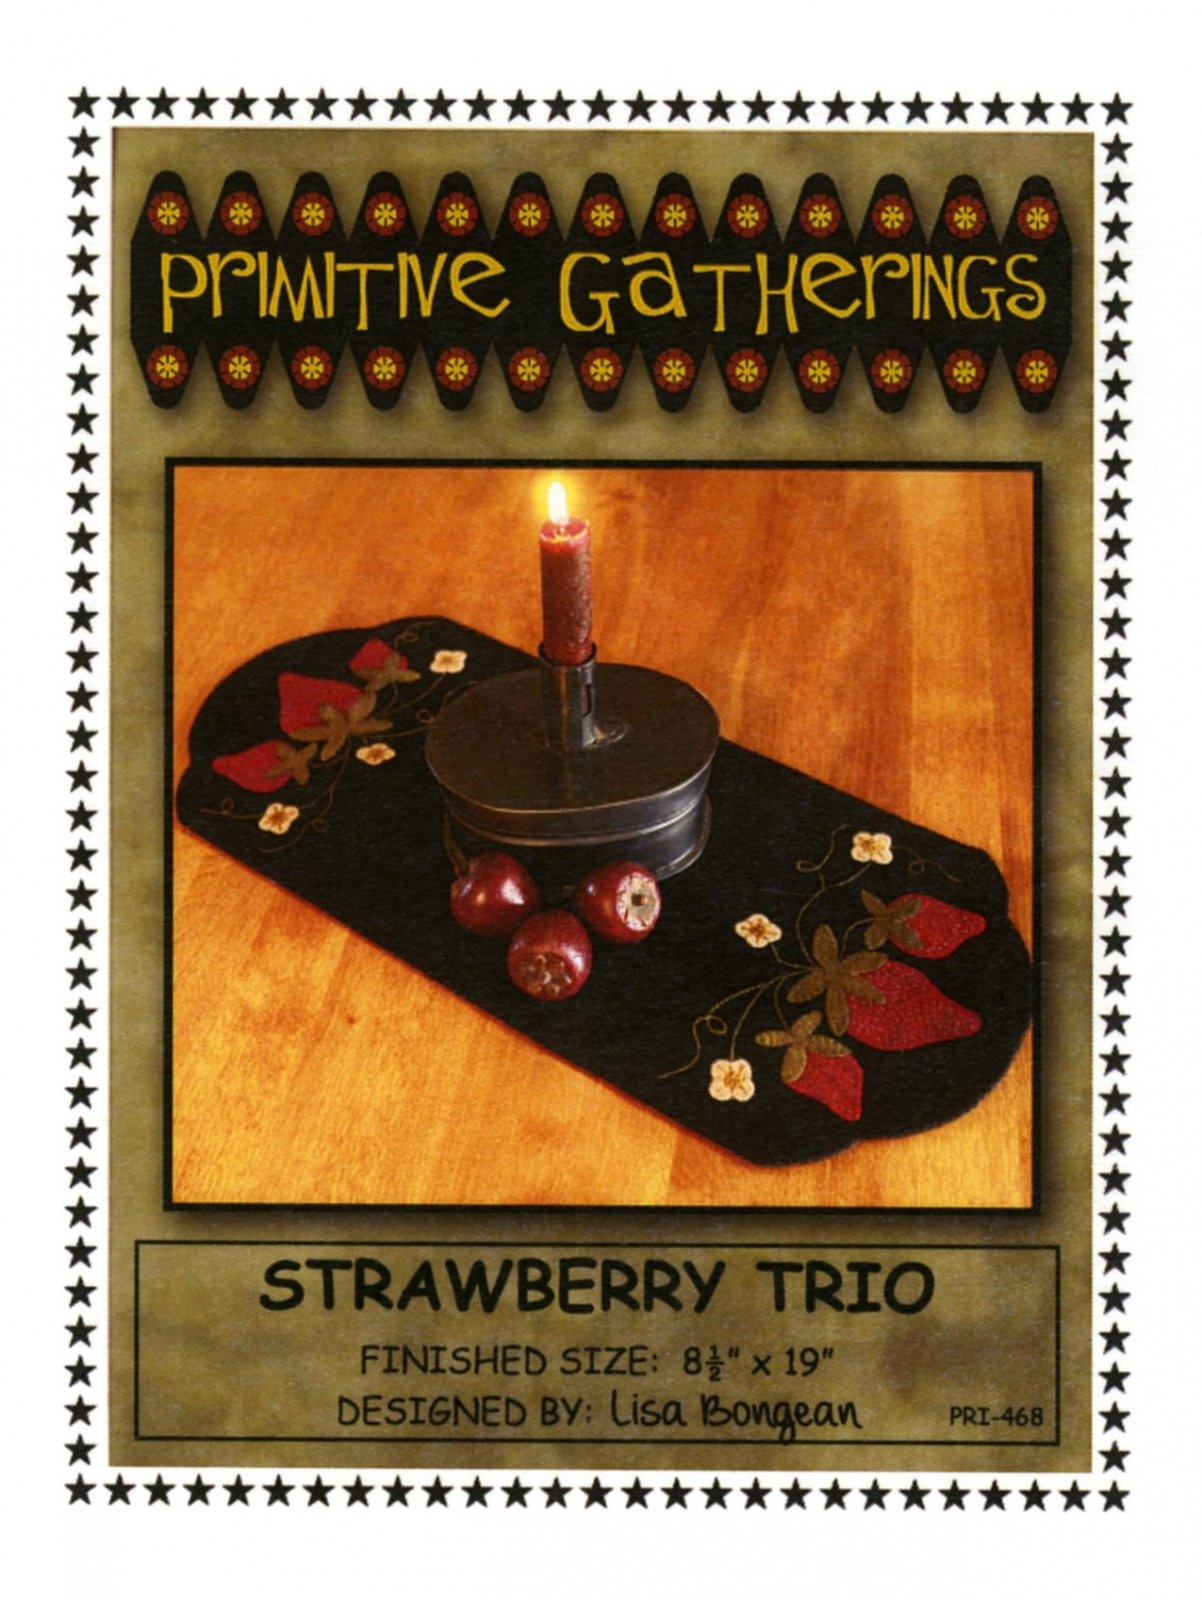 Valdani Strawberry Trio Collections of 5 Threads